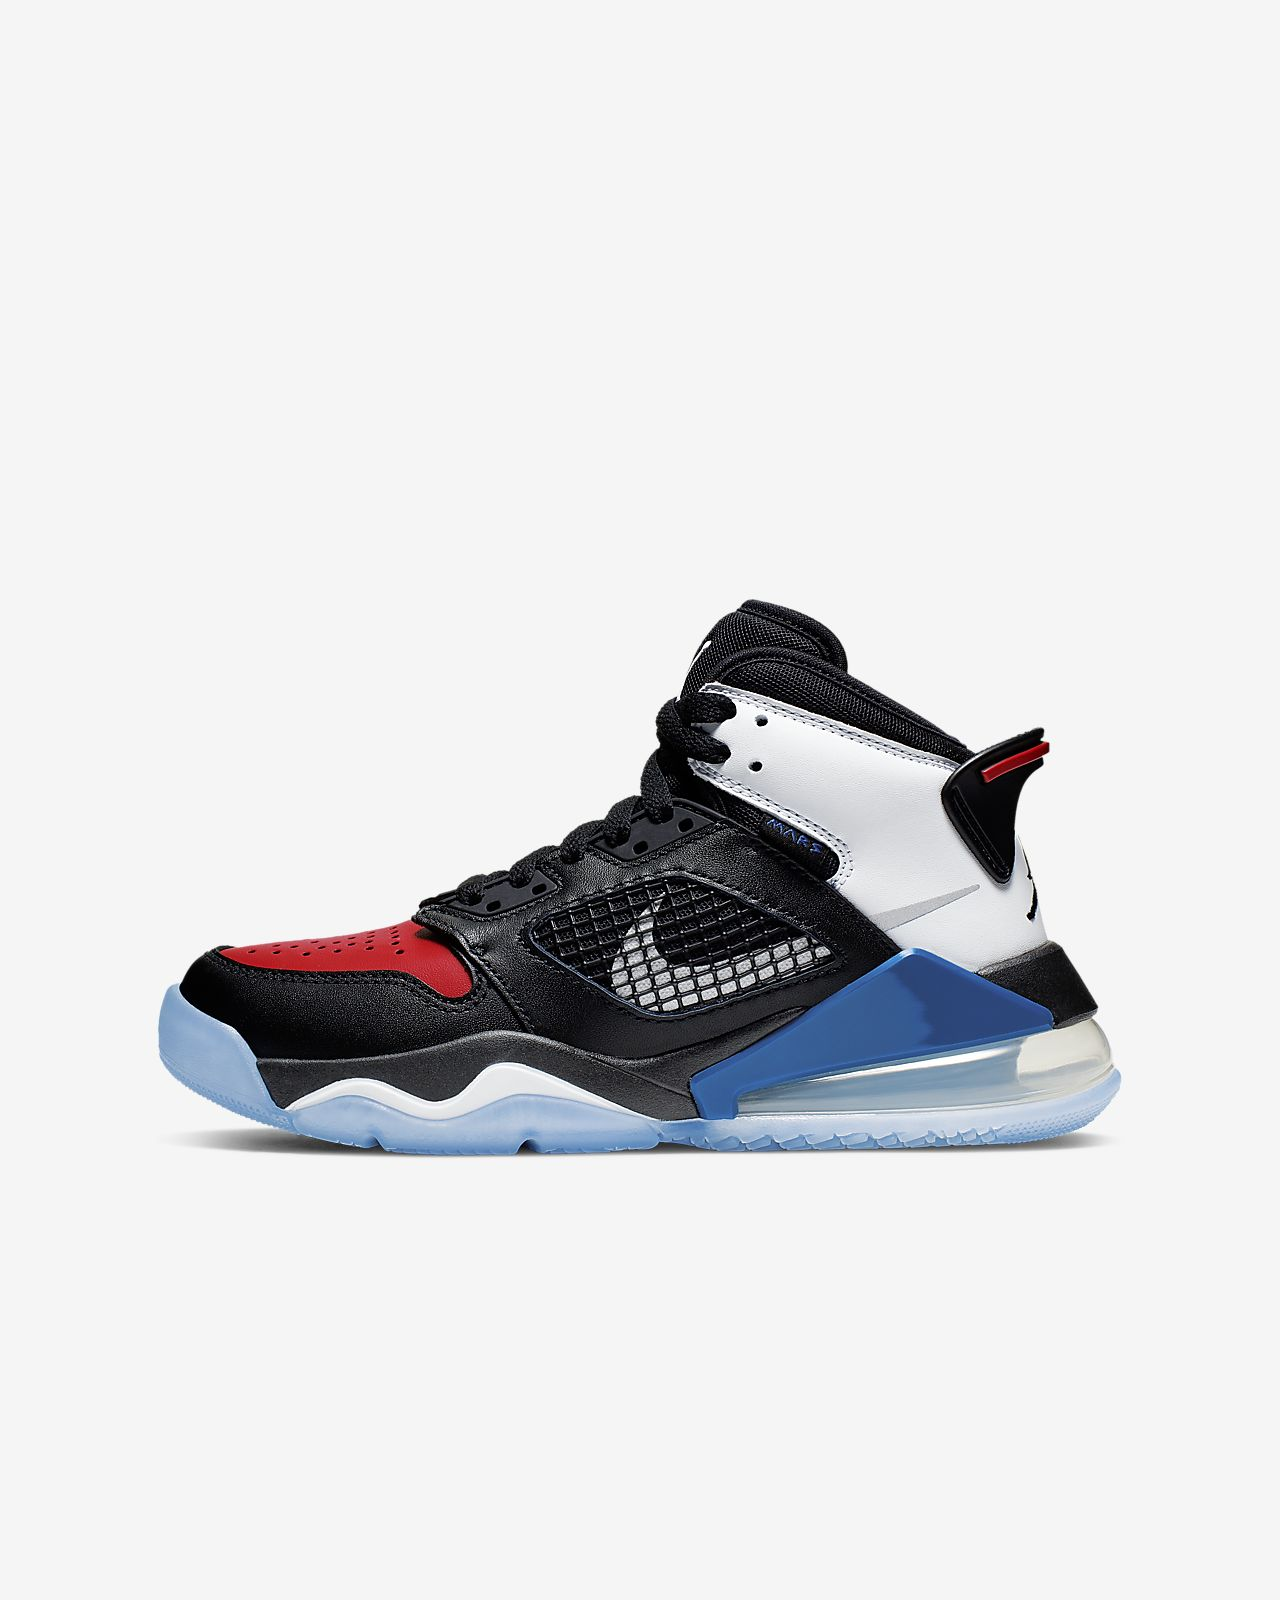 Jordan Mars 270 (GS) 大童运动童鞋